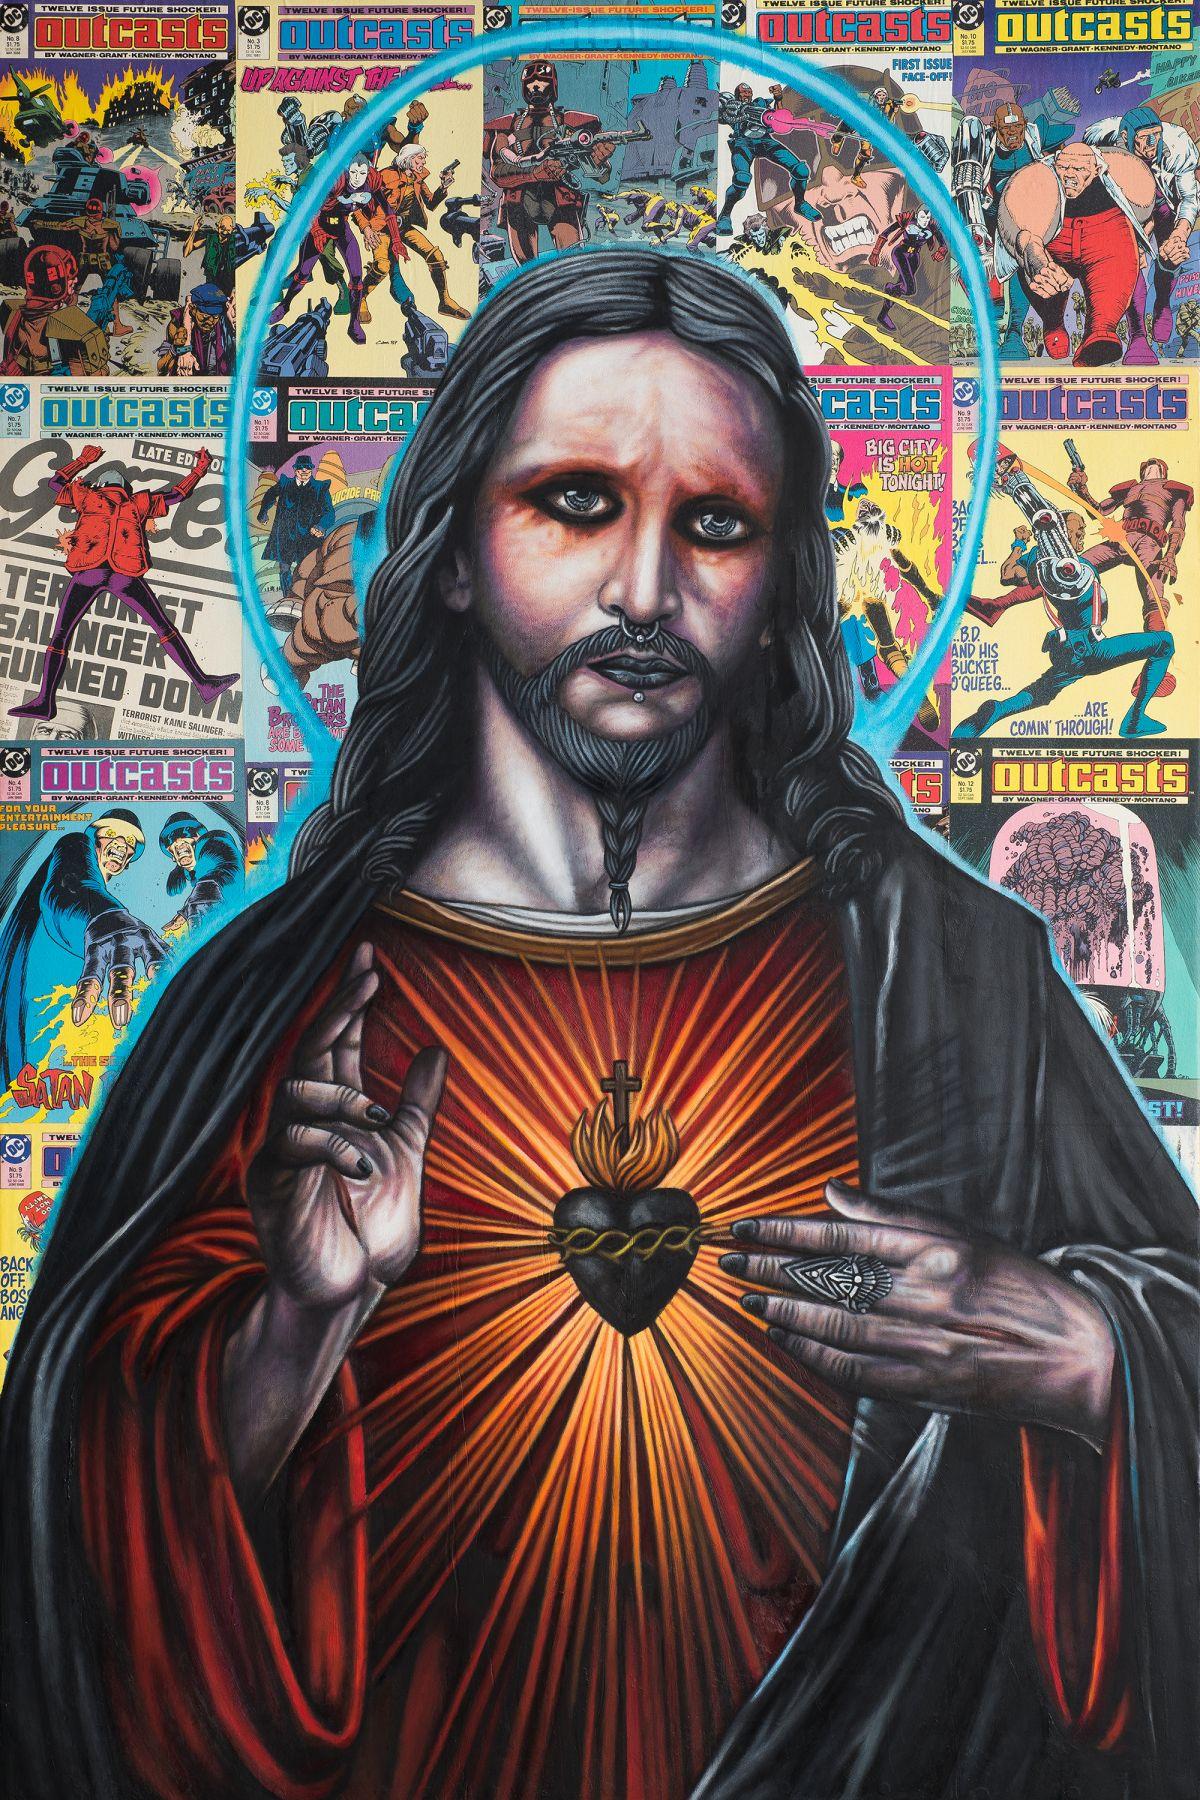 Outcasts (Jesus) by Michael LaBua